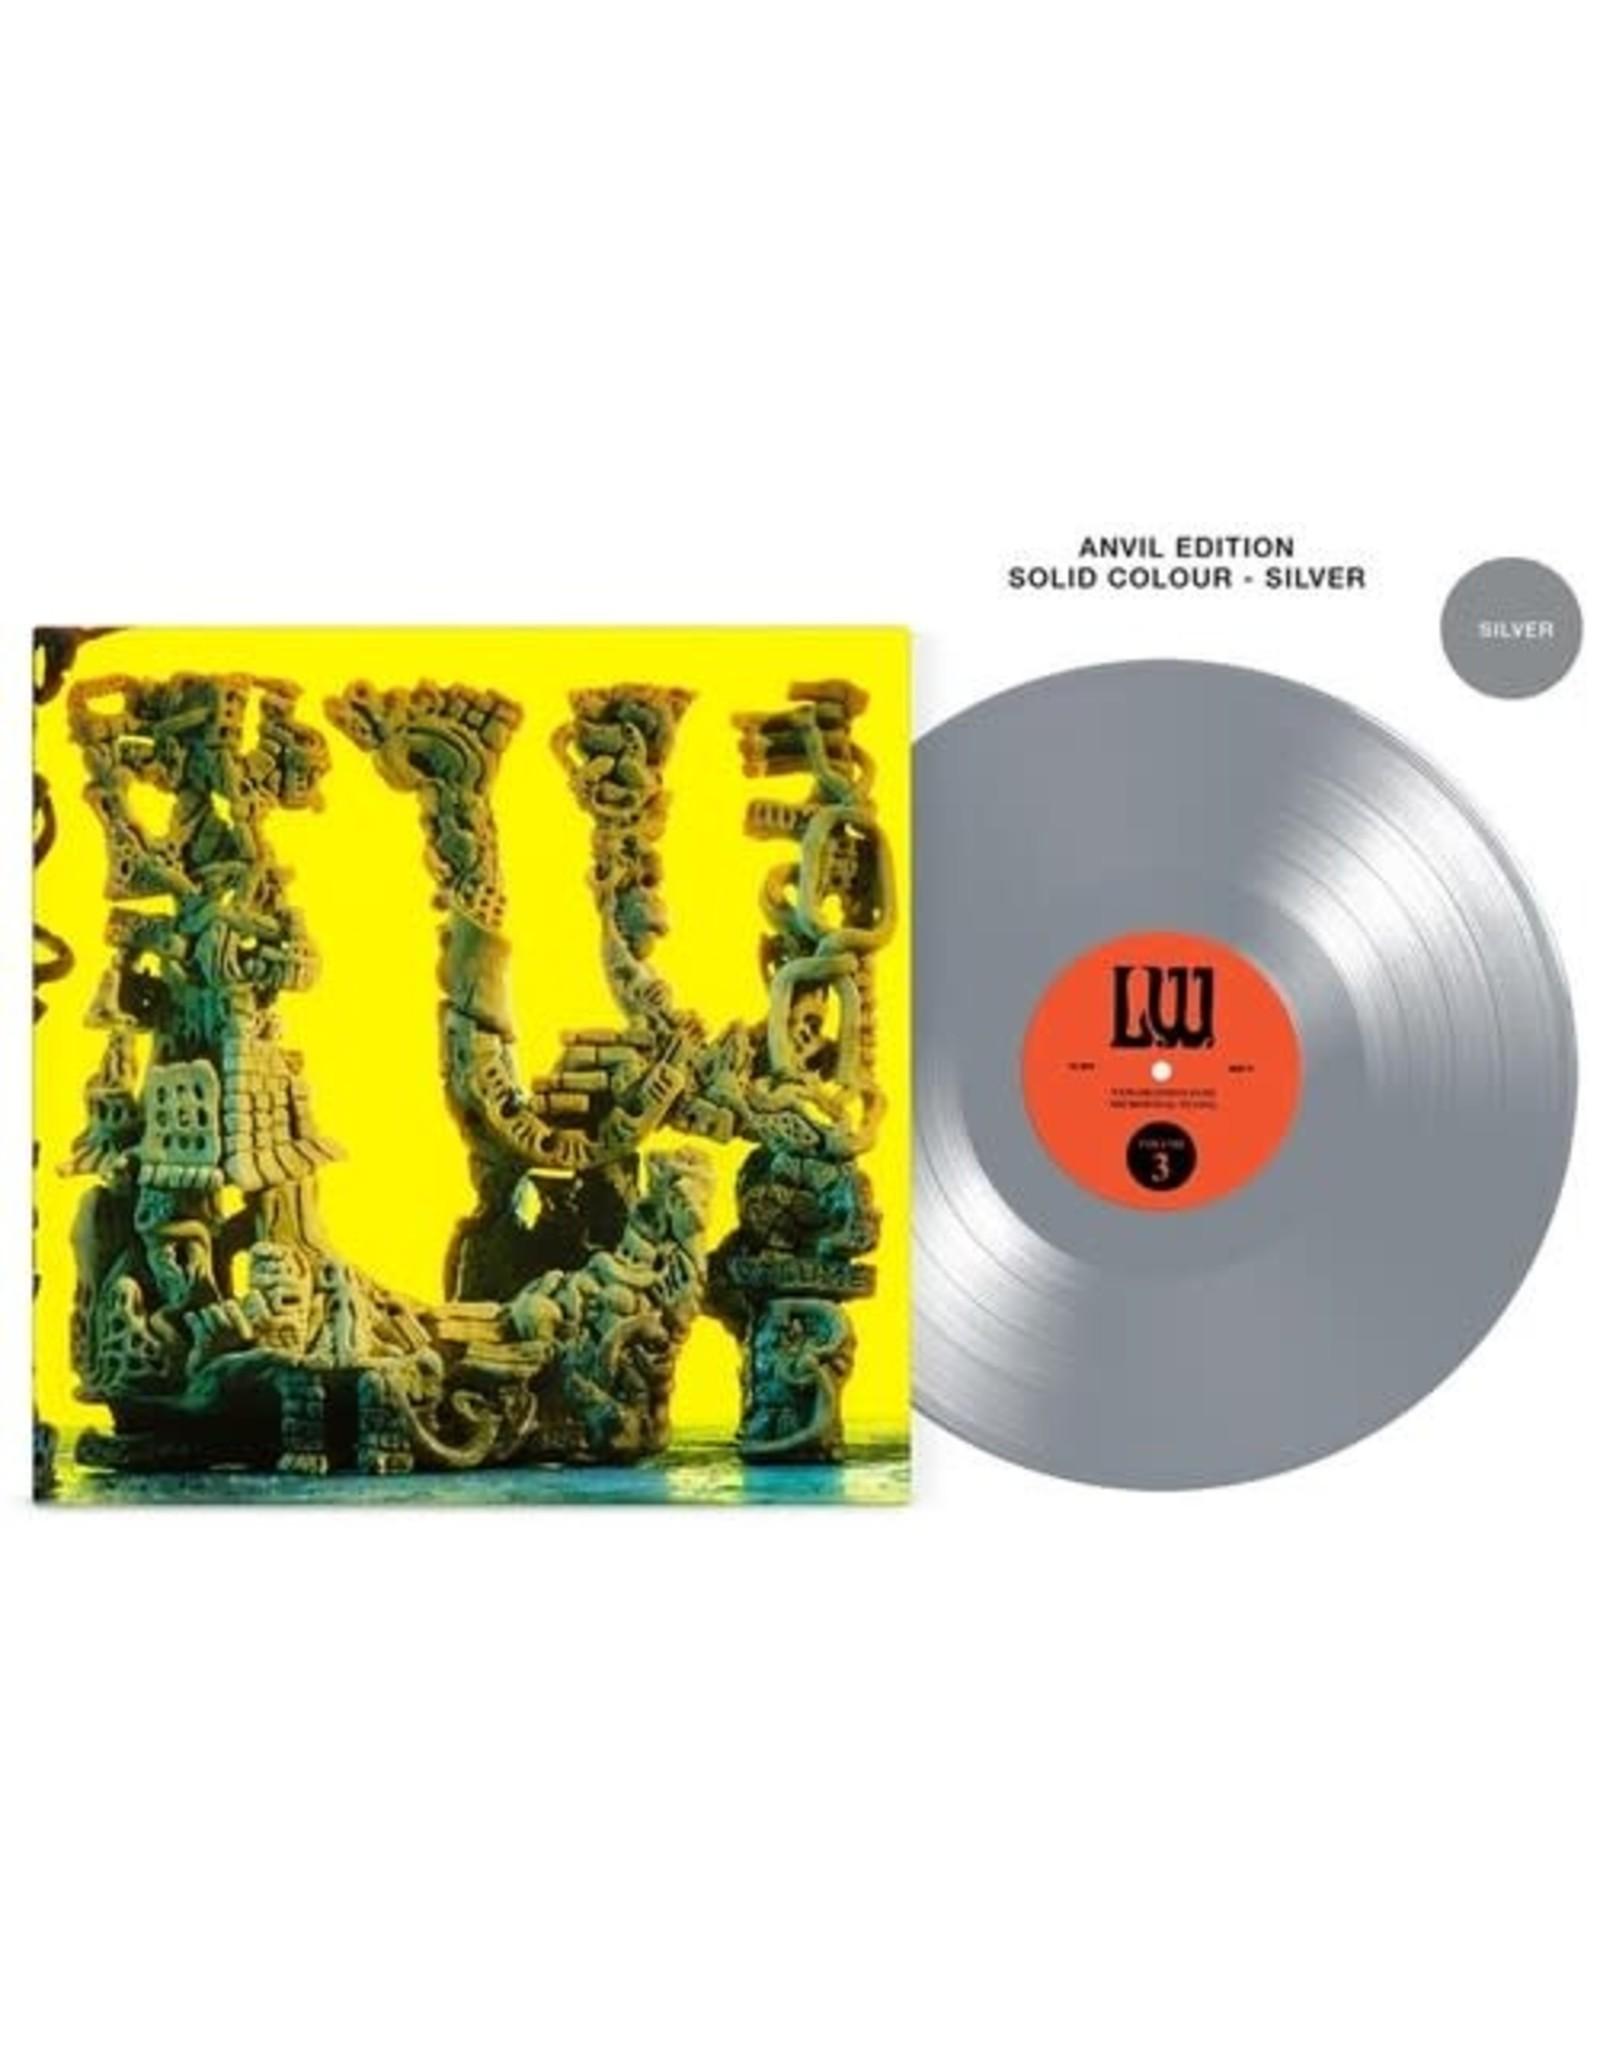 New Vinyl King Gizzard & The Lizard Wizard - L.W. (Anvil Edition) LP